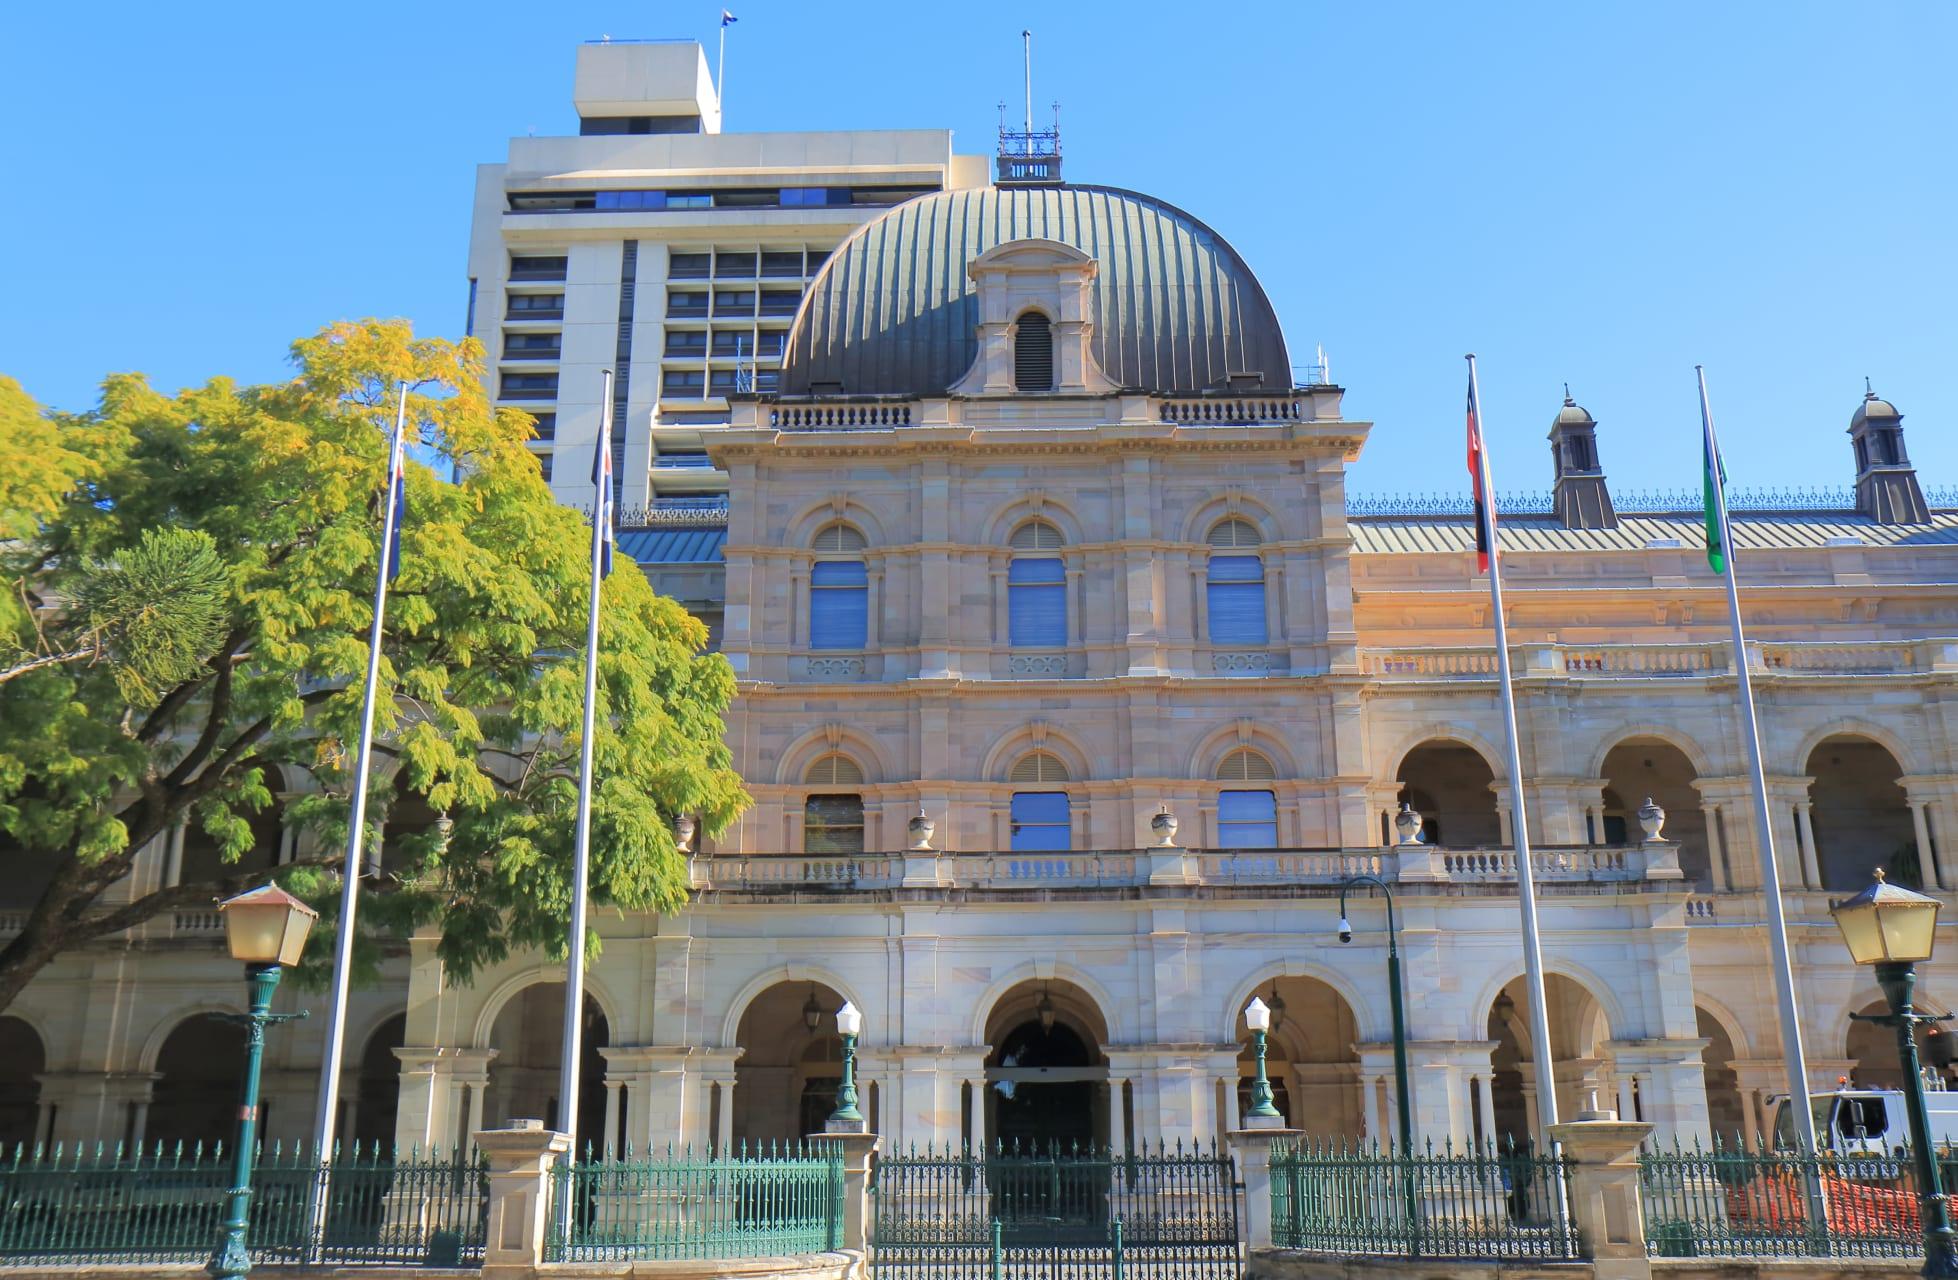 Brisbane - History and Nature in the CBD of Brisbane